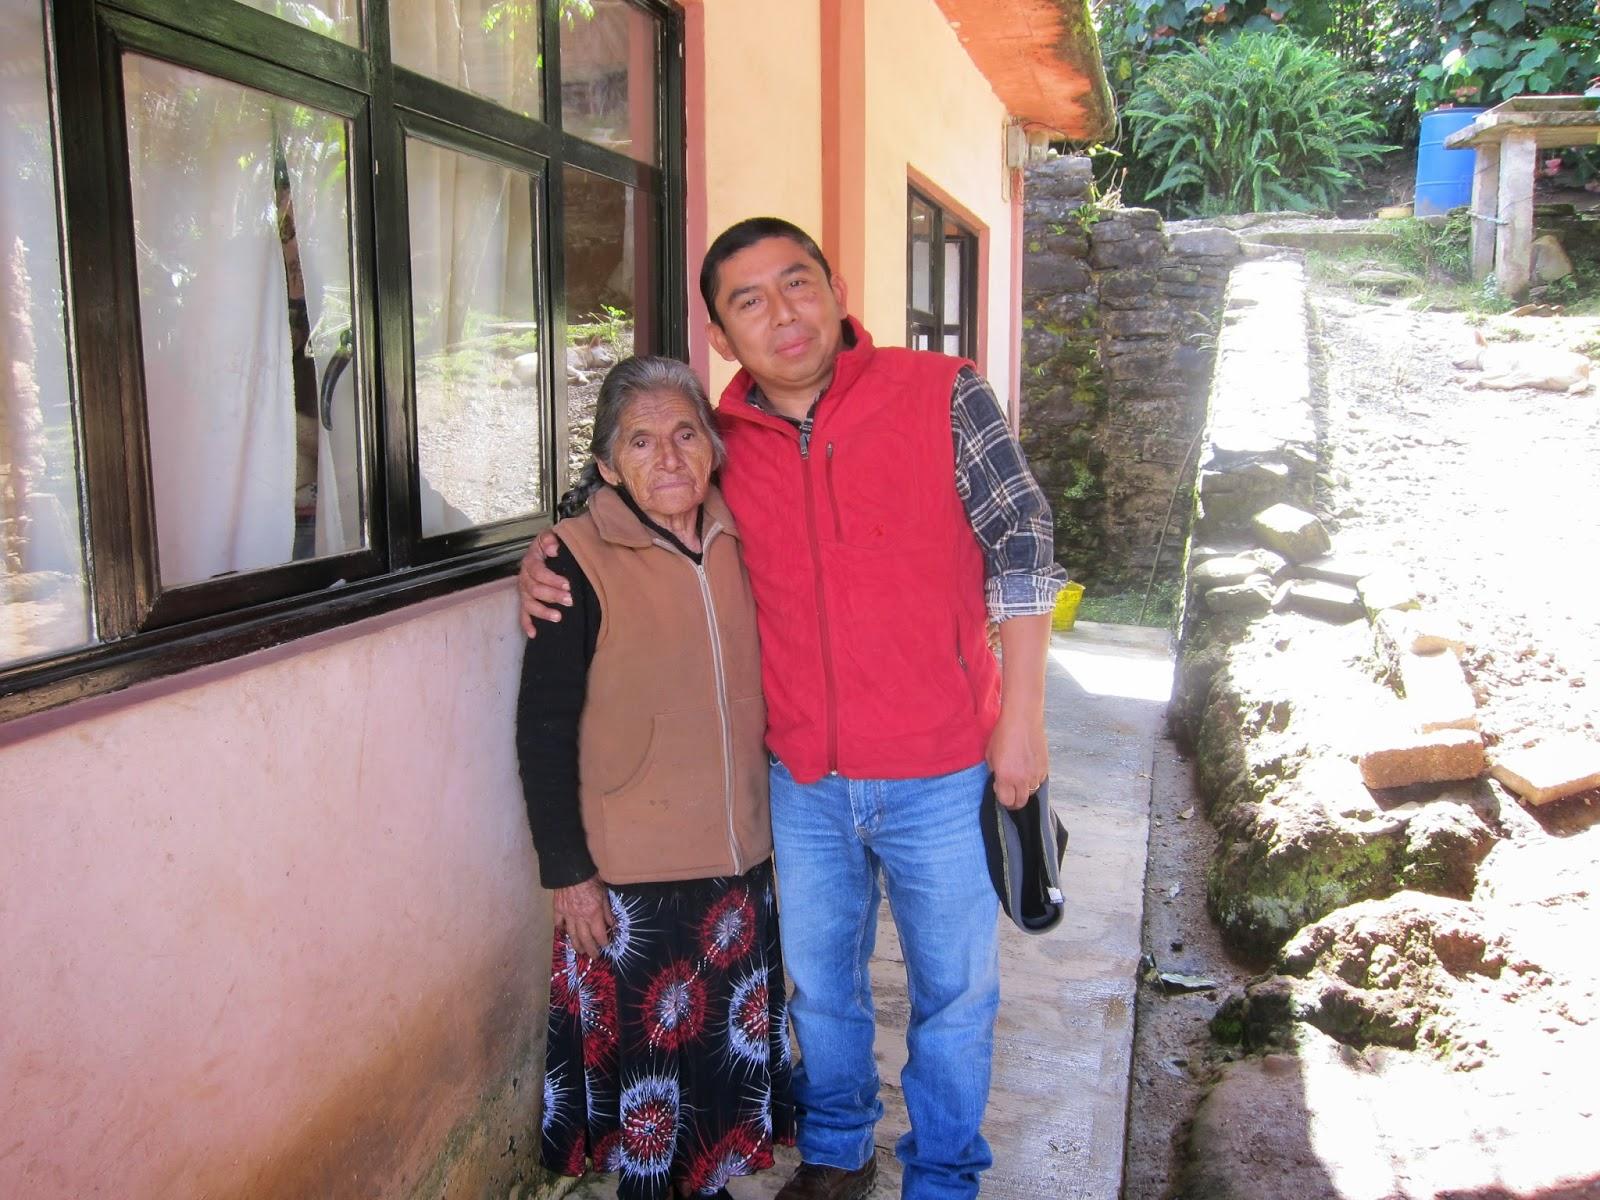 Eloxochitlan, Oaxaca, December 14, Violence, Elisa Zepeda, Gaspar Chable